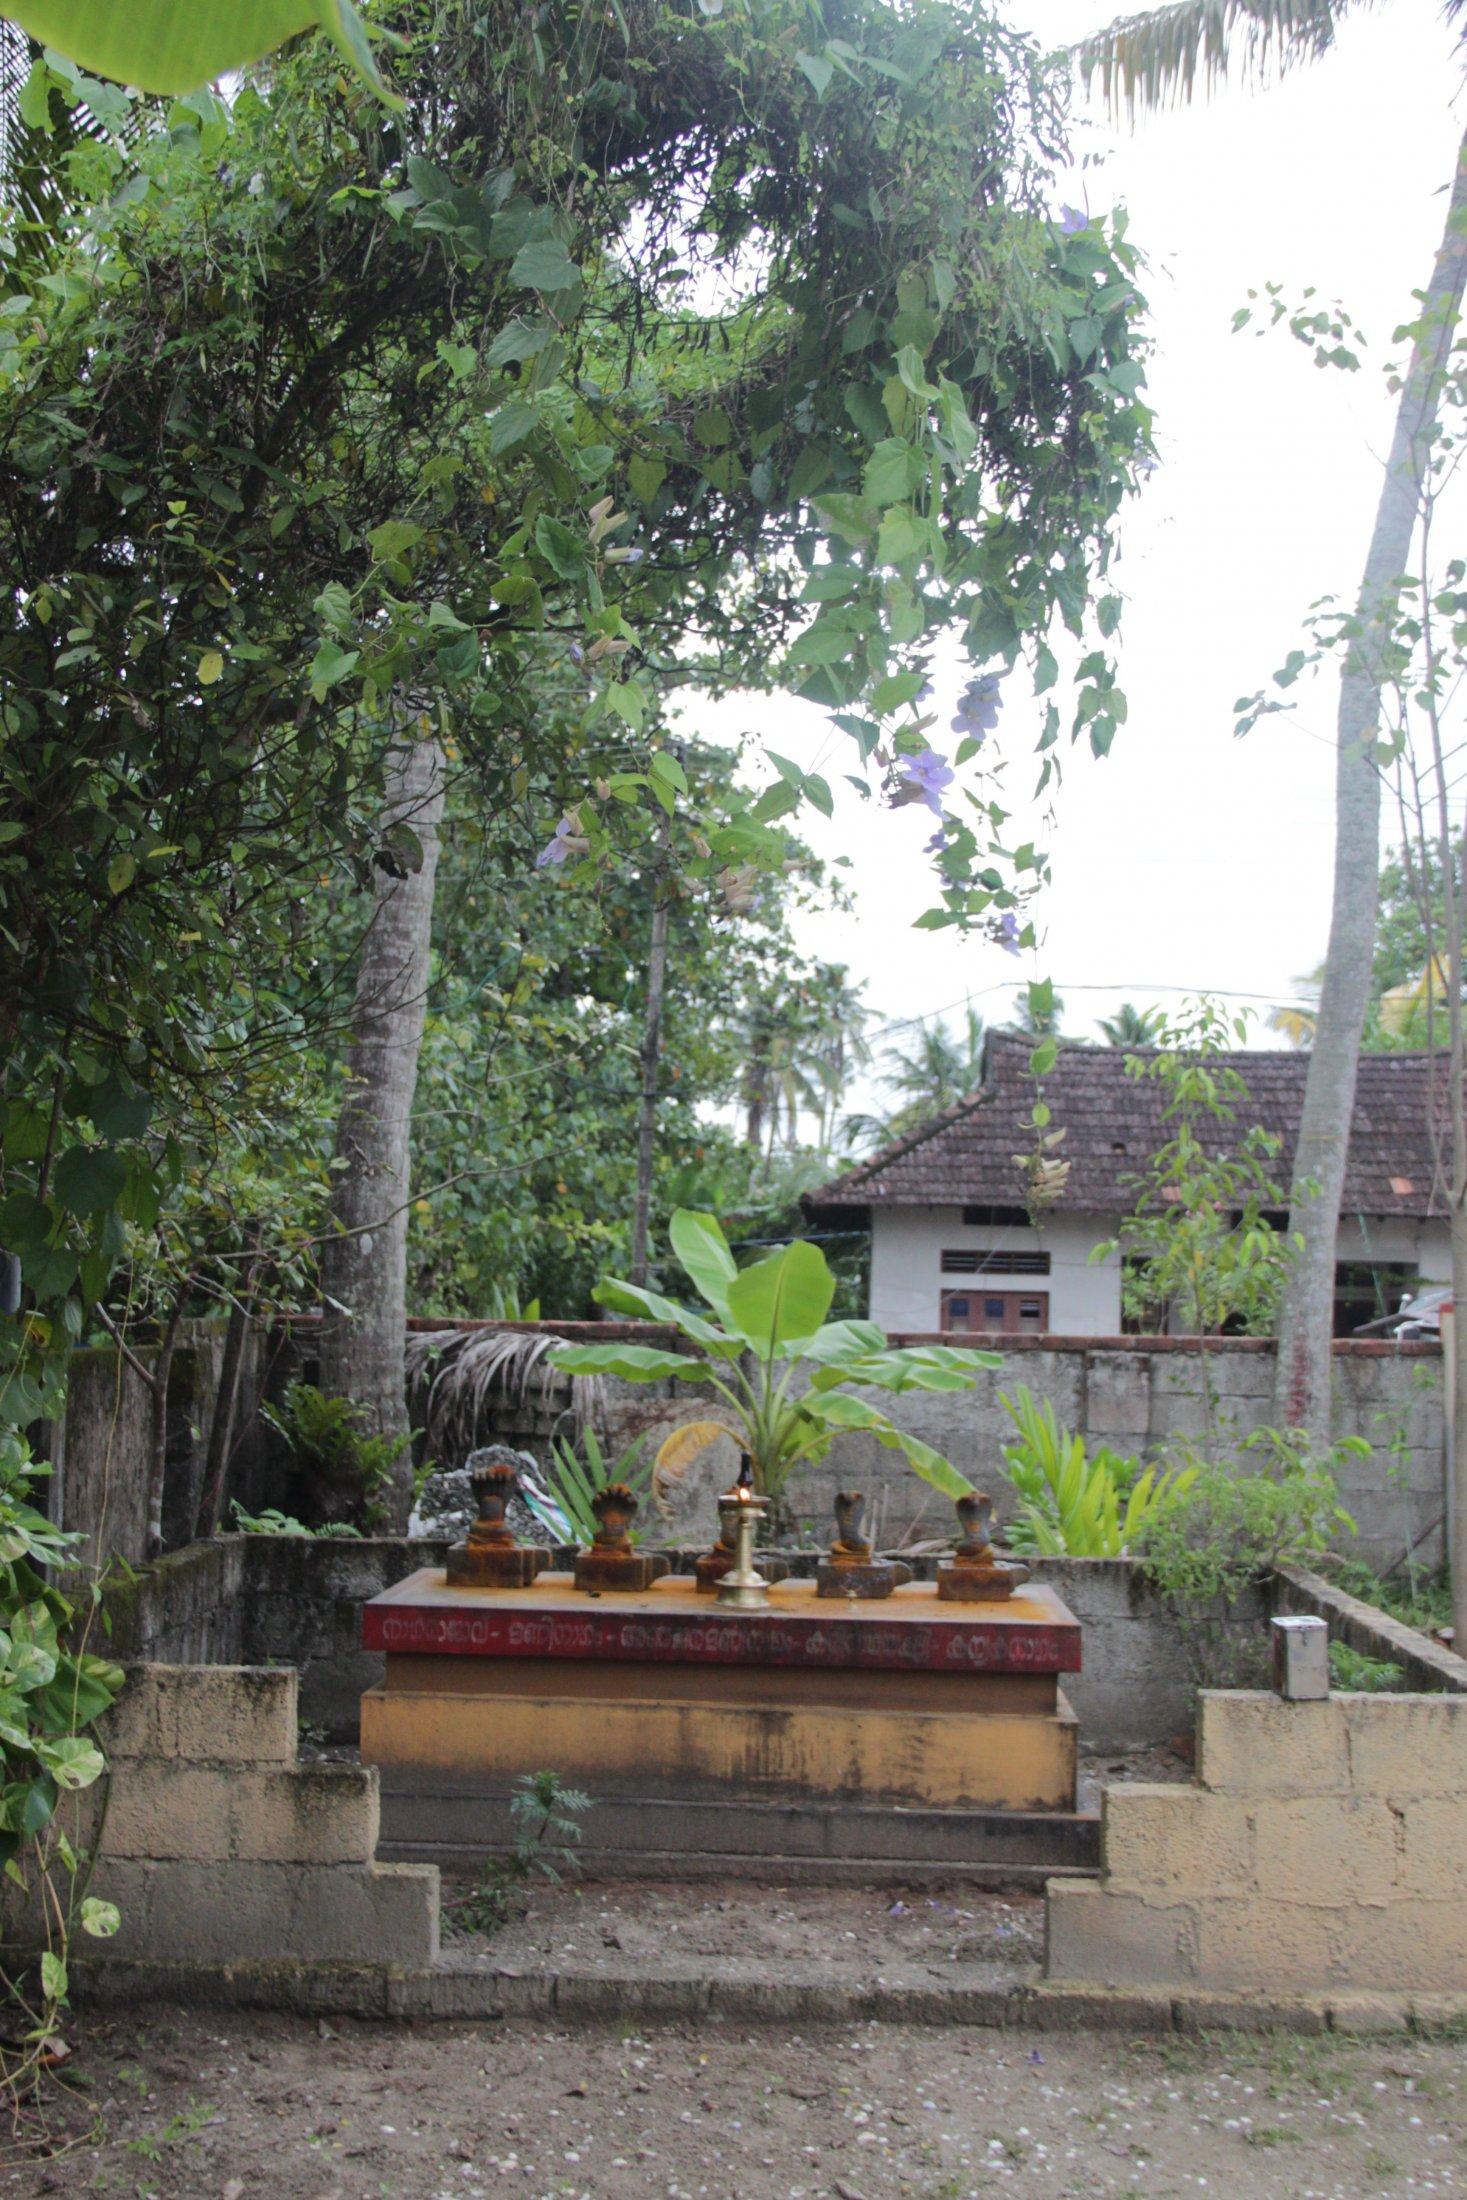 Sacred Grove with Shrines for Snake Gods